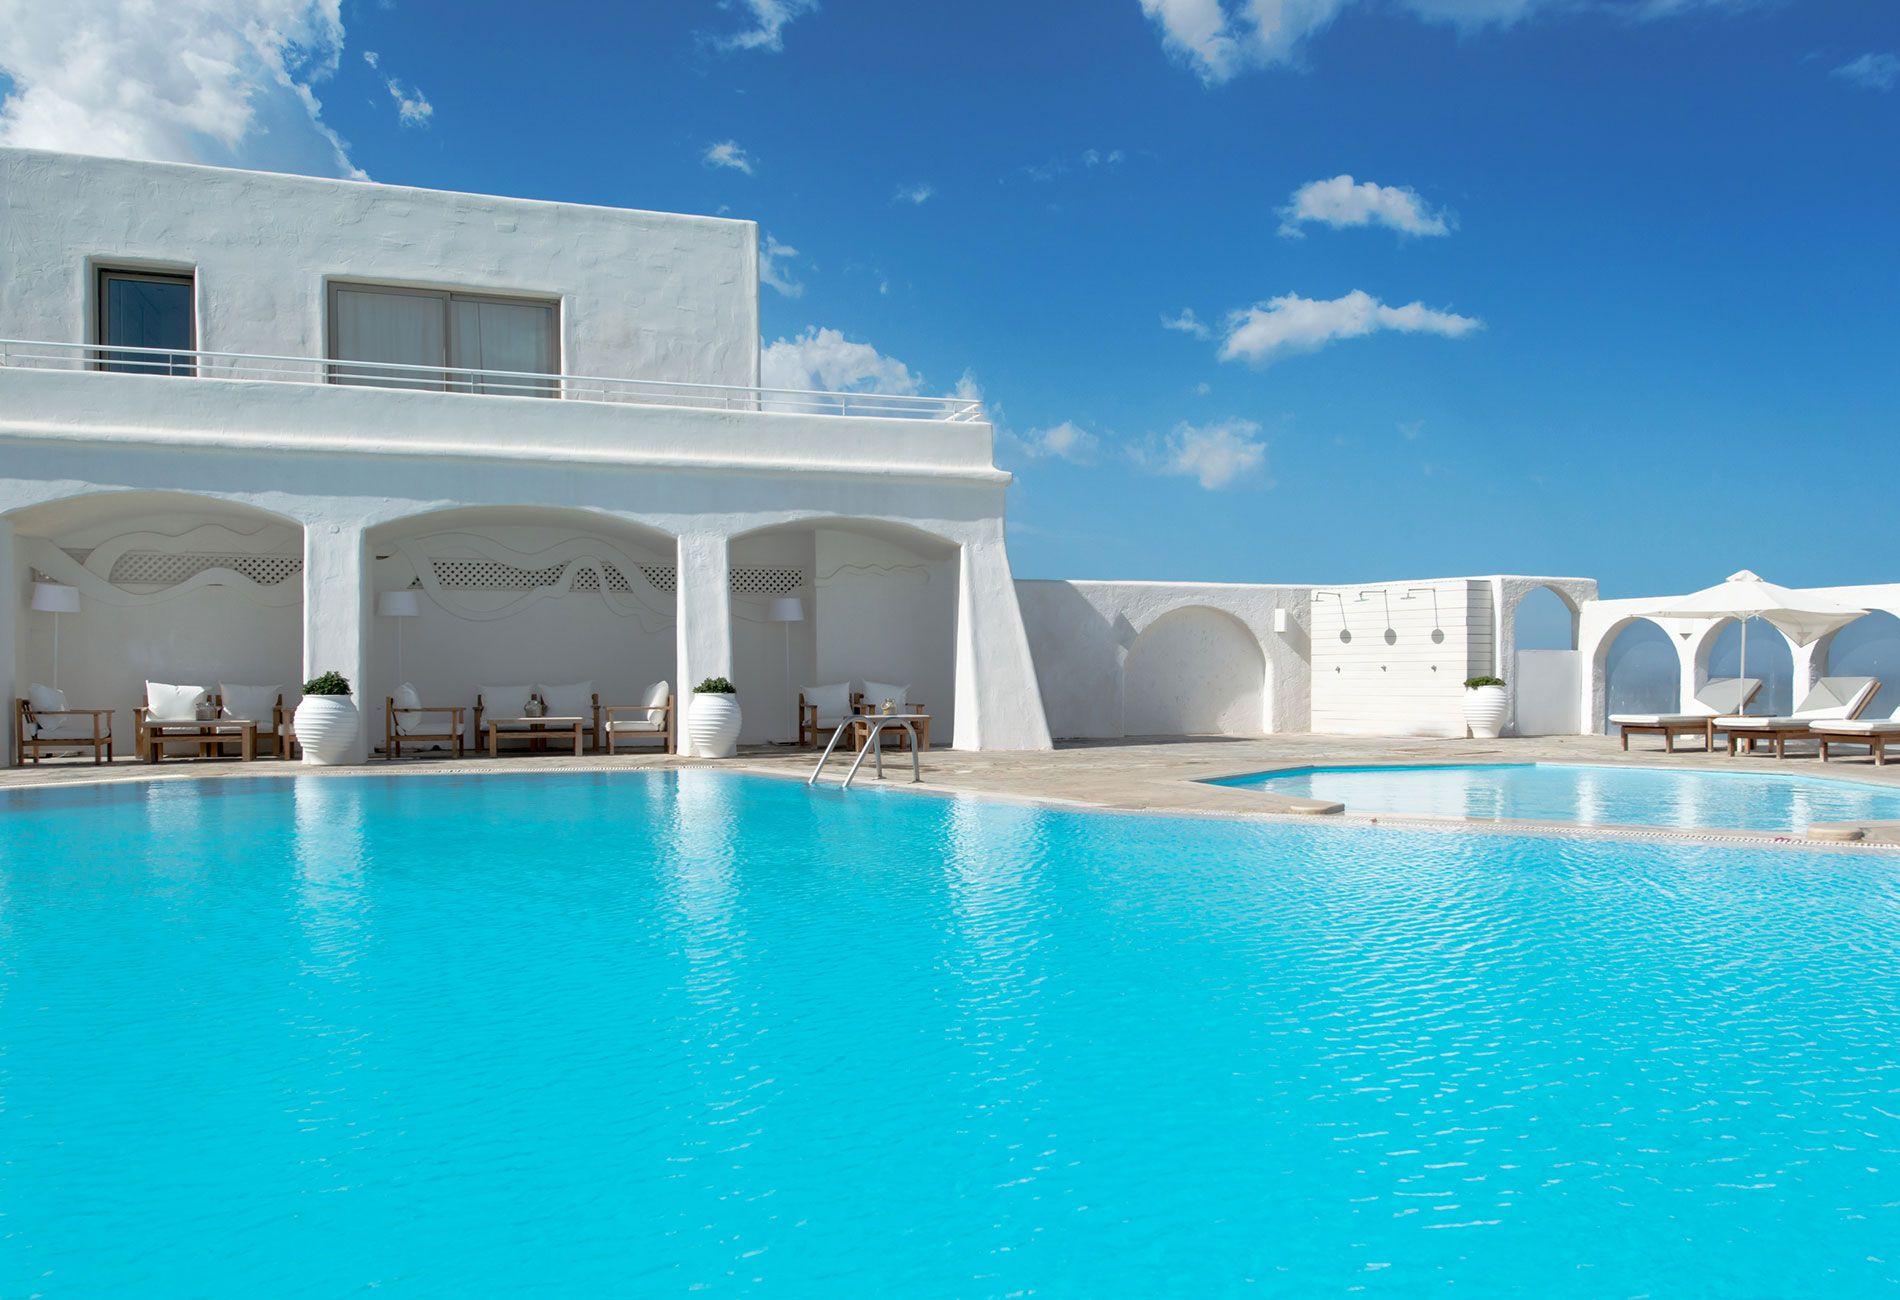 4* Knossos Beach Bungalows & Suites - Ηράκλειο, Kρήτη ✦ 4 Ημέρες (3 Διανυκτερεύσεις) ✦ 2 άτομα ✦ Ημιδιατροφή ✦ 01/09/2021 έως 30/09/2021 ✦ Μπροστά στην Παραλία!